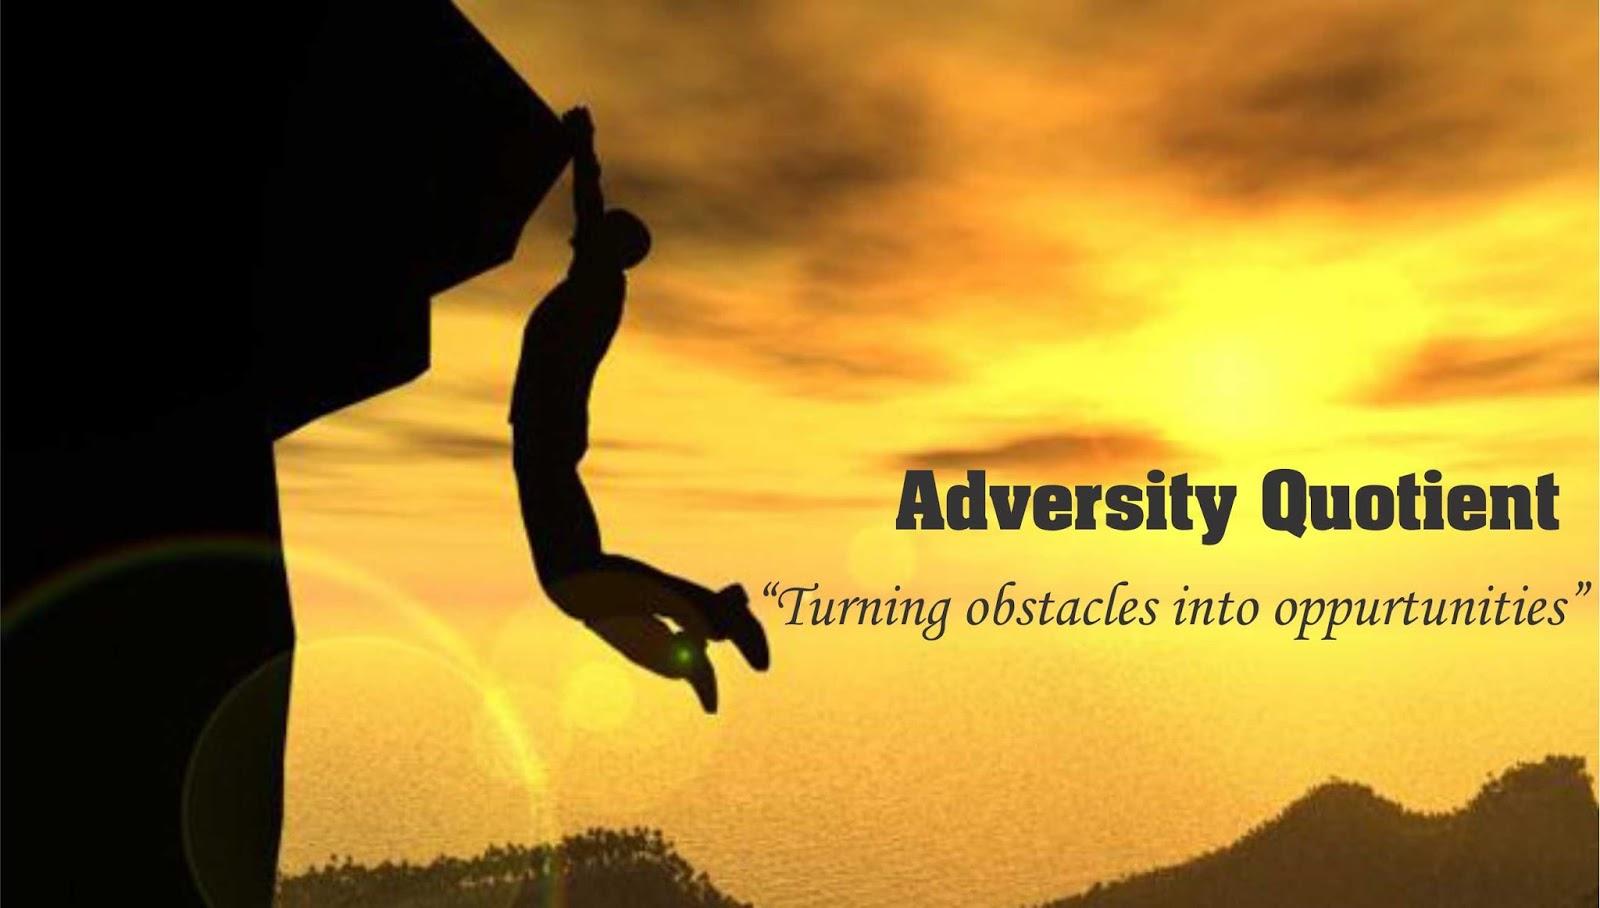 「(Adversity Quotient)」的圖片搜尋結果